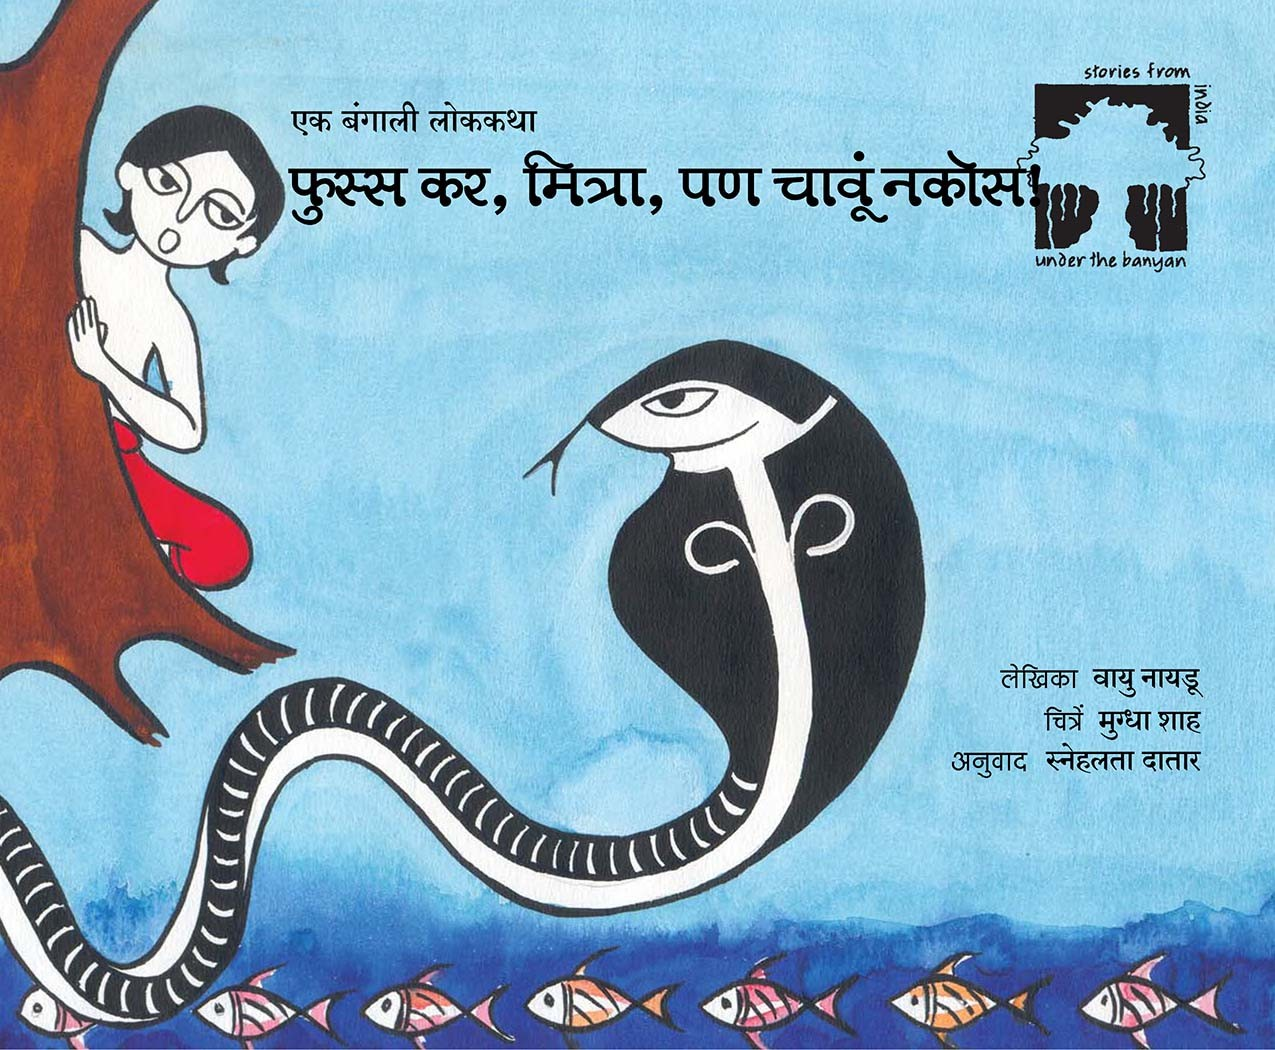 Hiss Don't Bite/Phuss Kar, Mitra, Pan Chavoon Nakos  (Marathi)